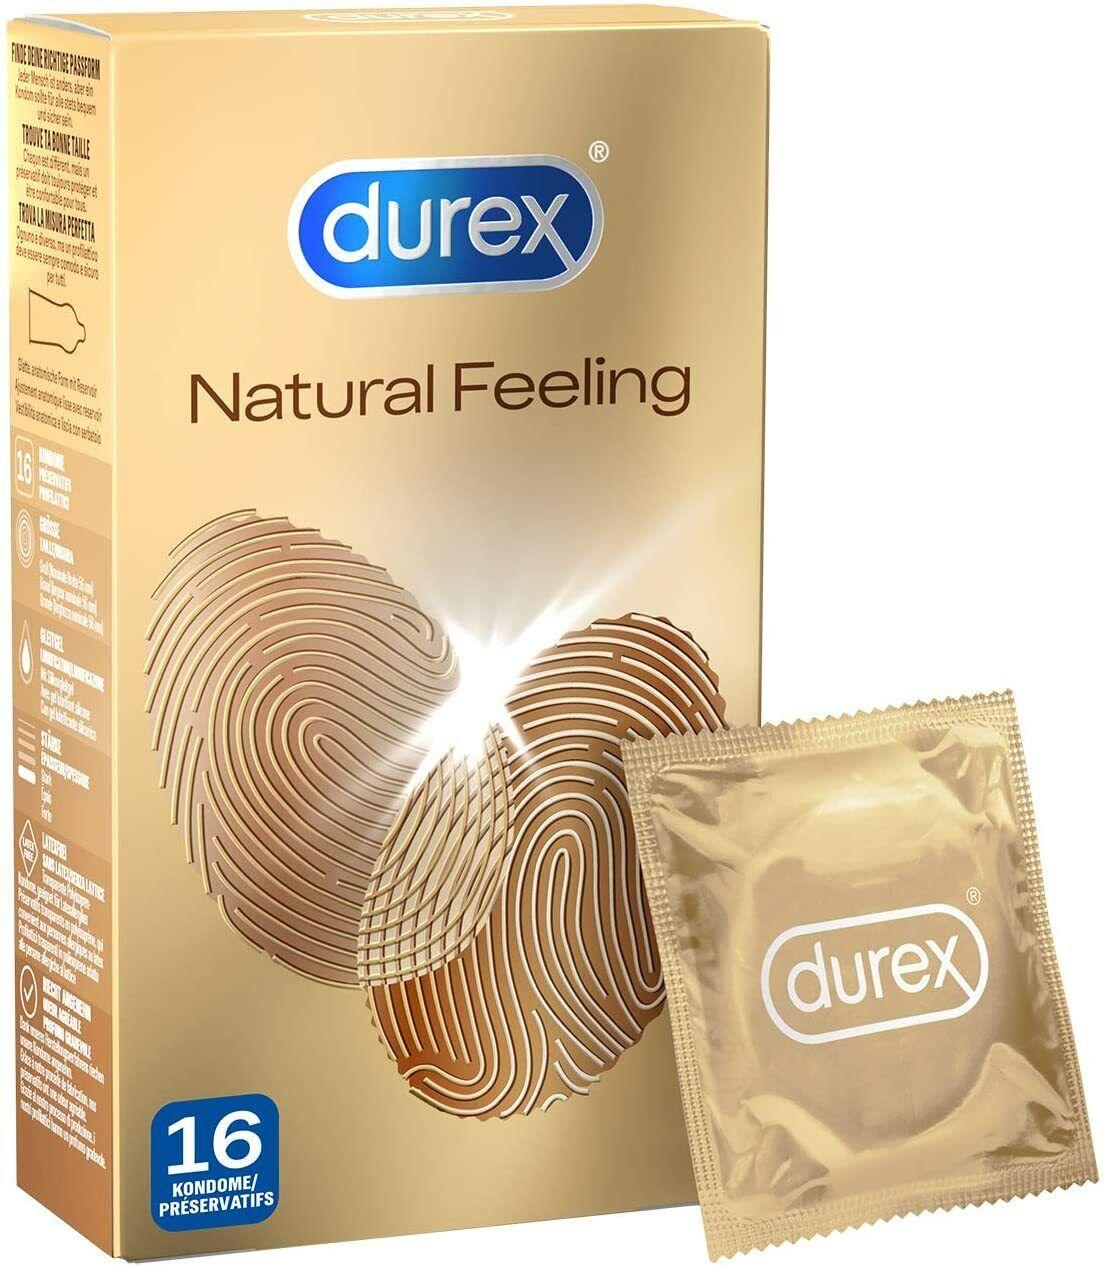 Durex Natural Feeling latexfreie Kondome Präservative Verhütungsmittel 16 Stück